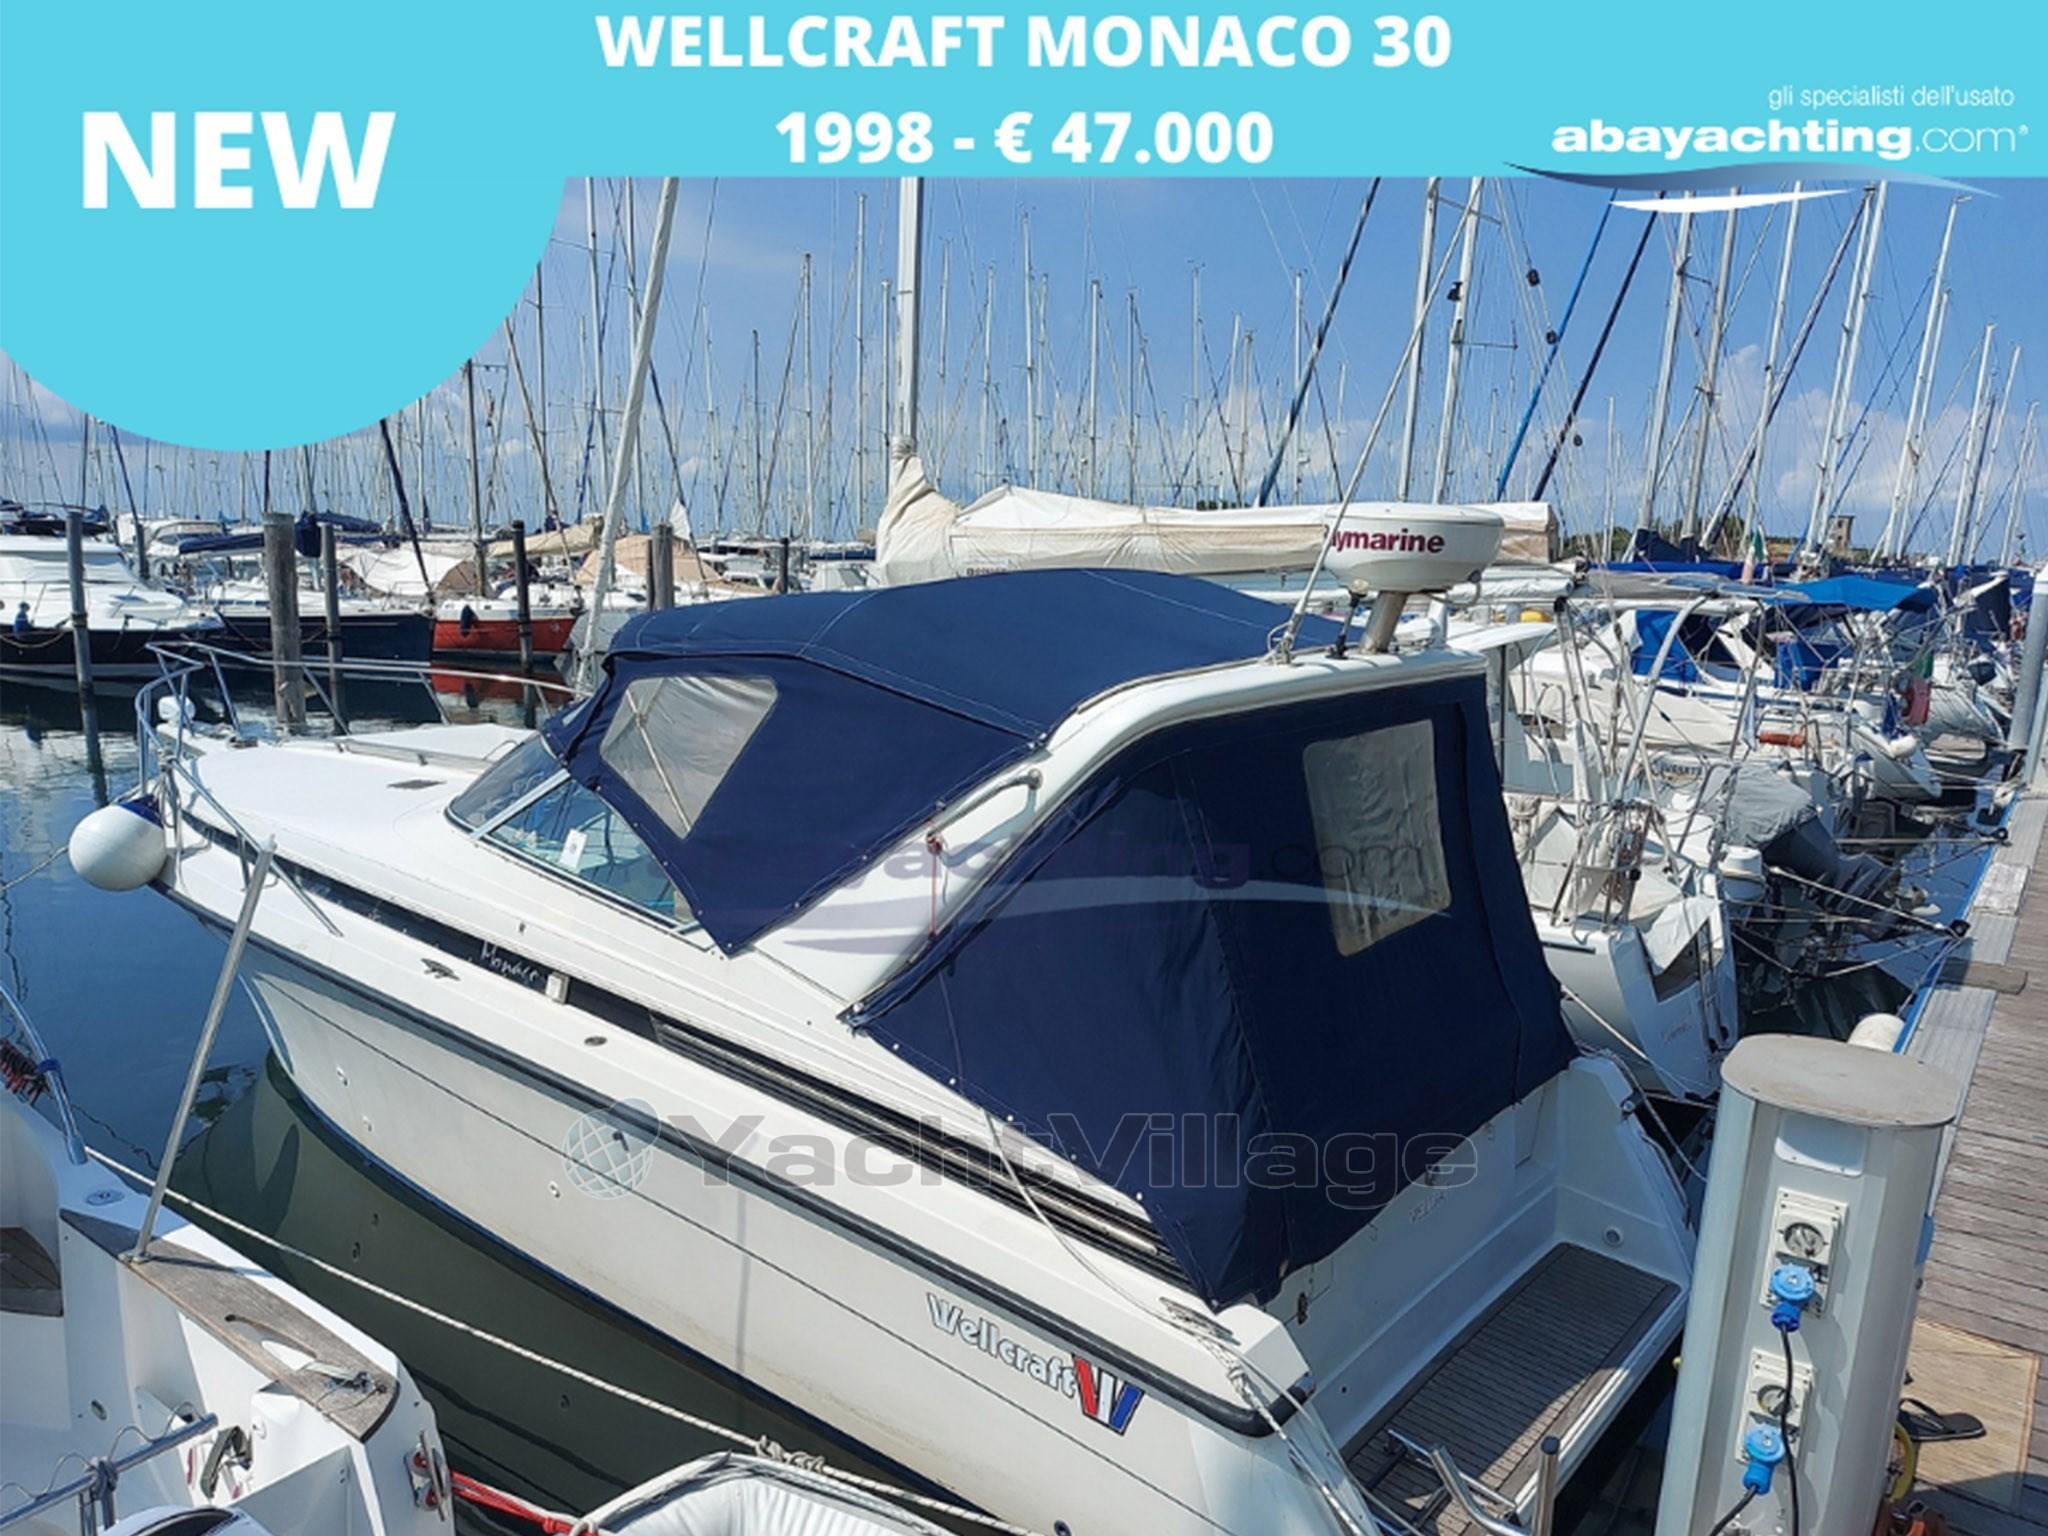 Abayachting Nuovo arrivo Wellcraft Monaco 30